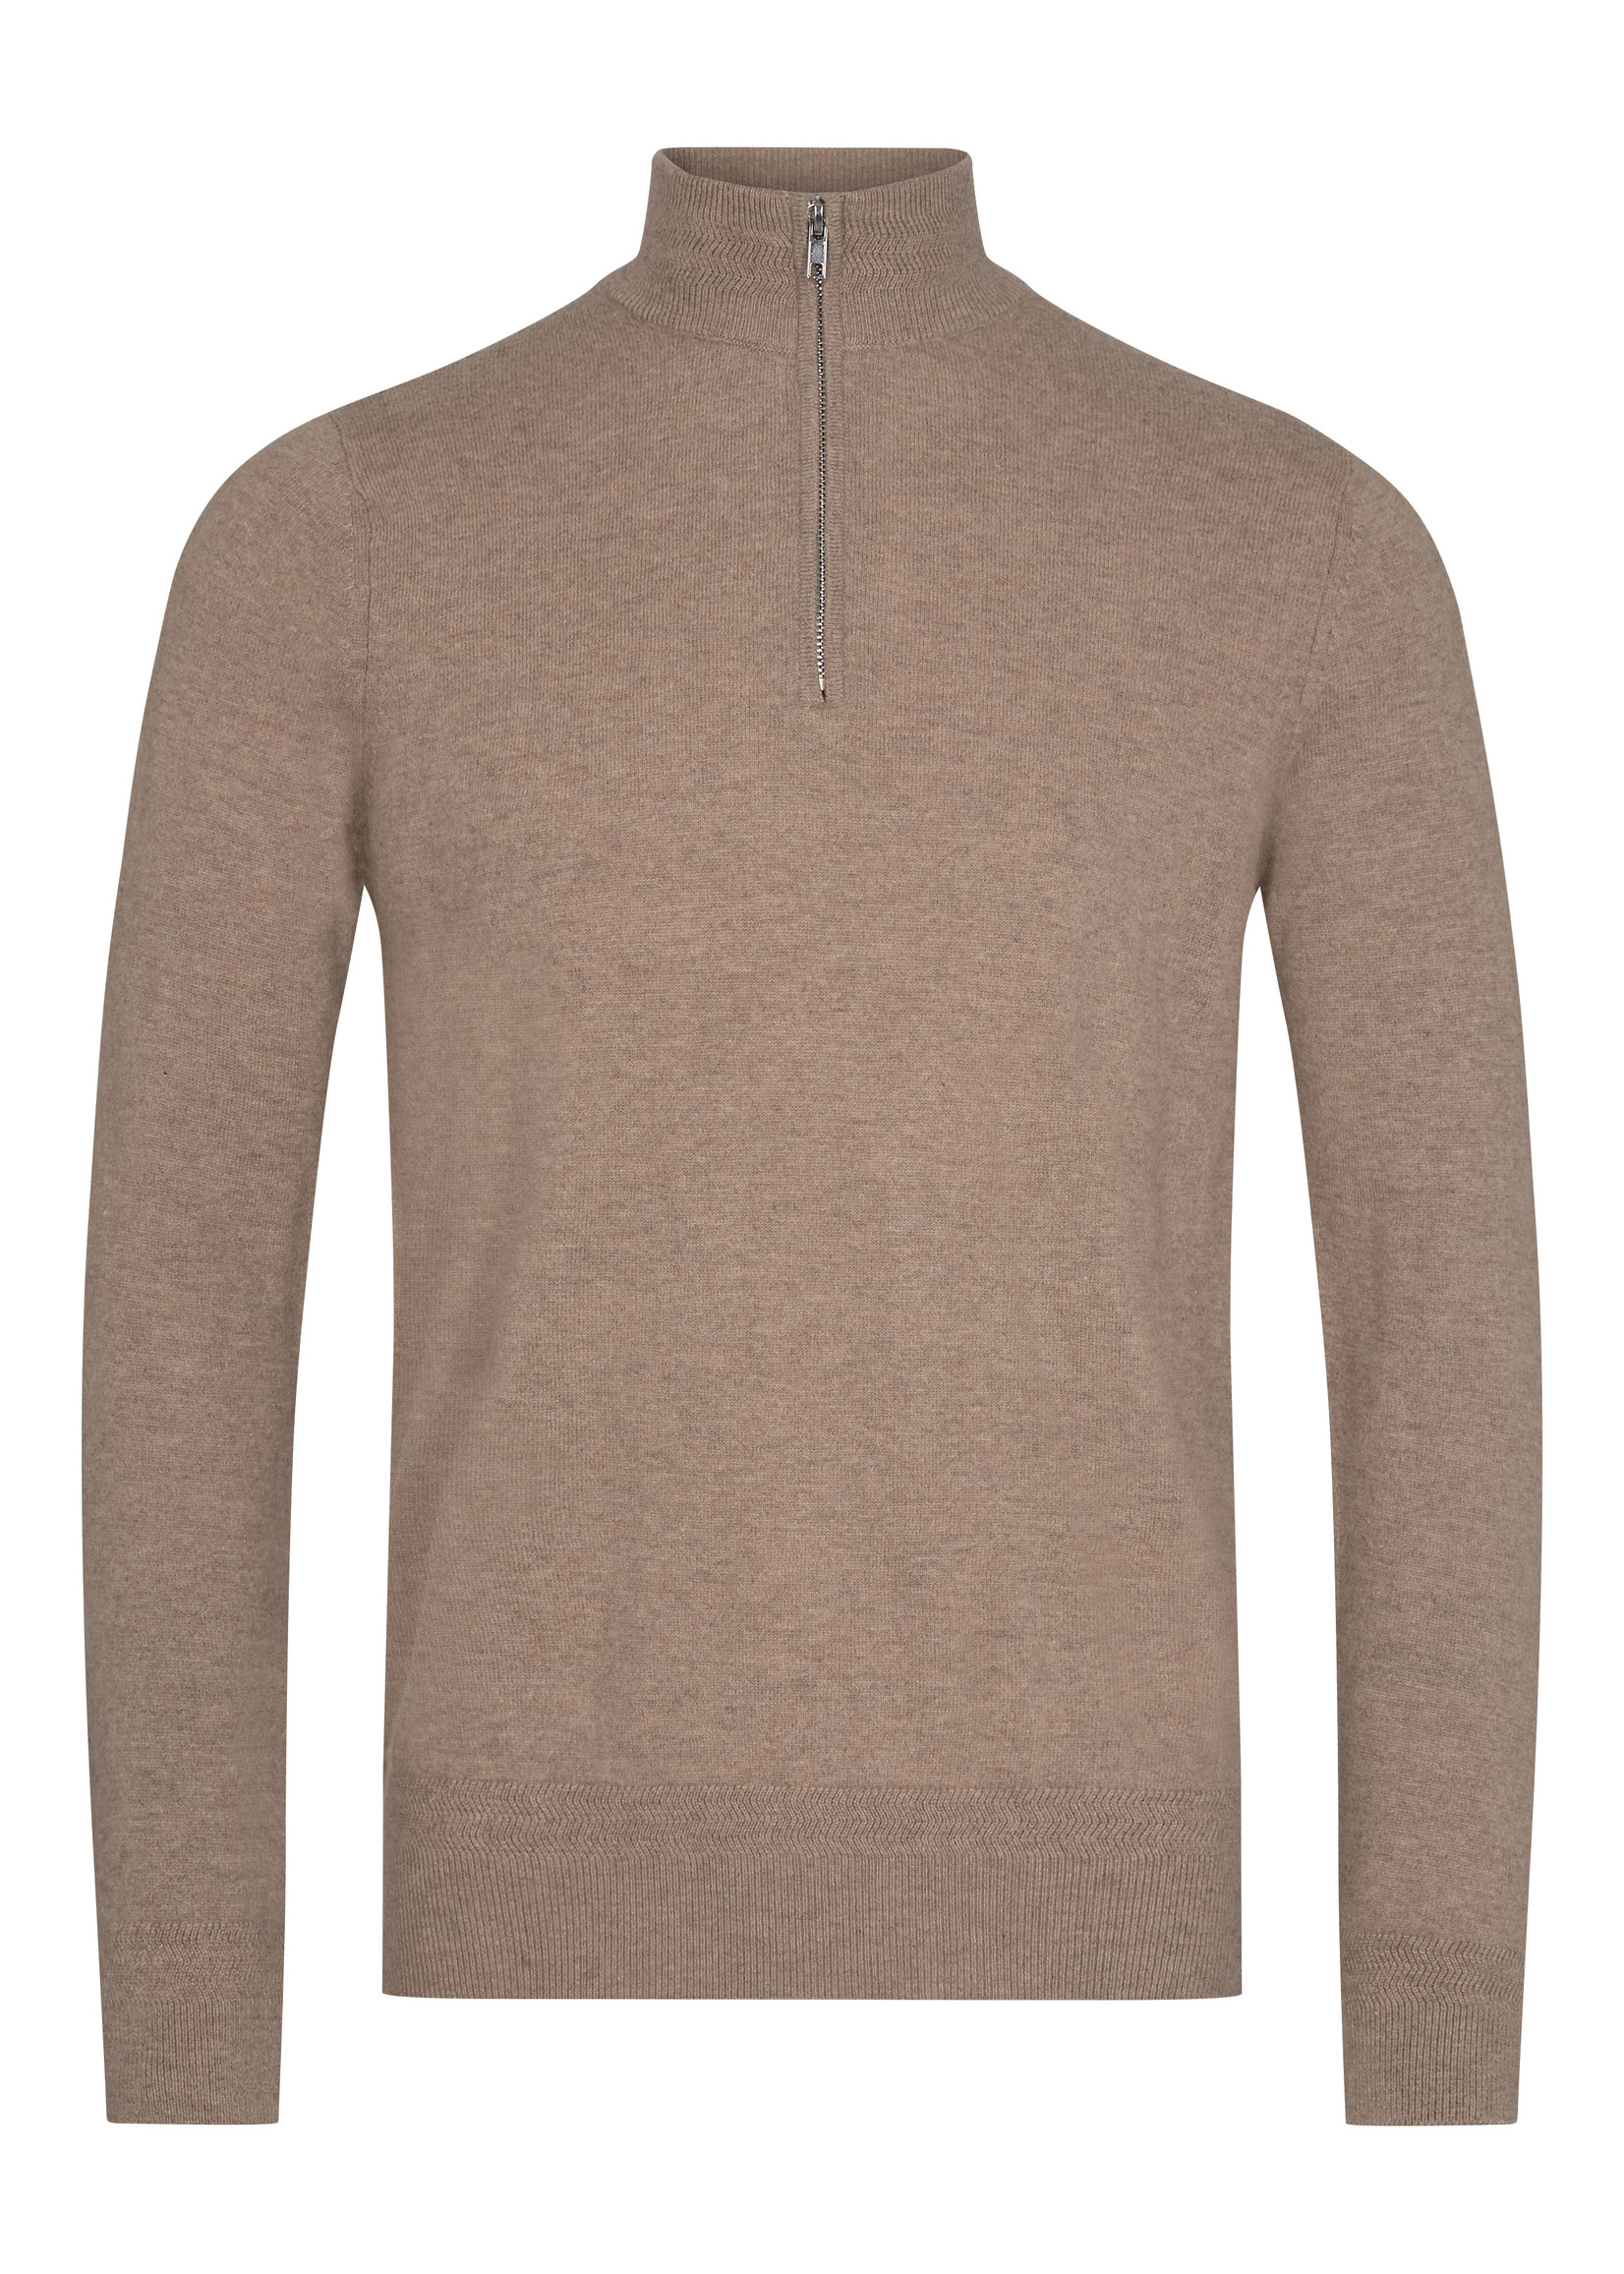 Bruun & Stengade Cashmere Quarter-Zip Sweater 2102-04009